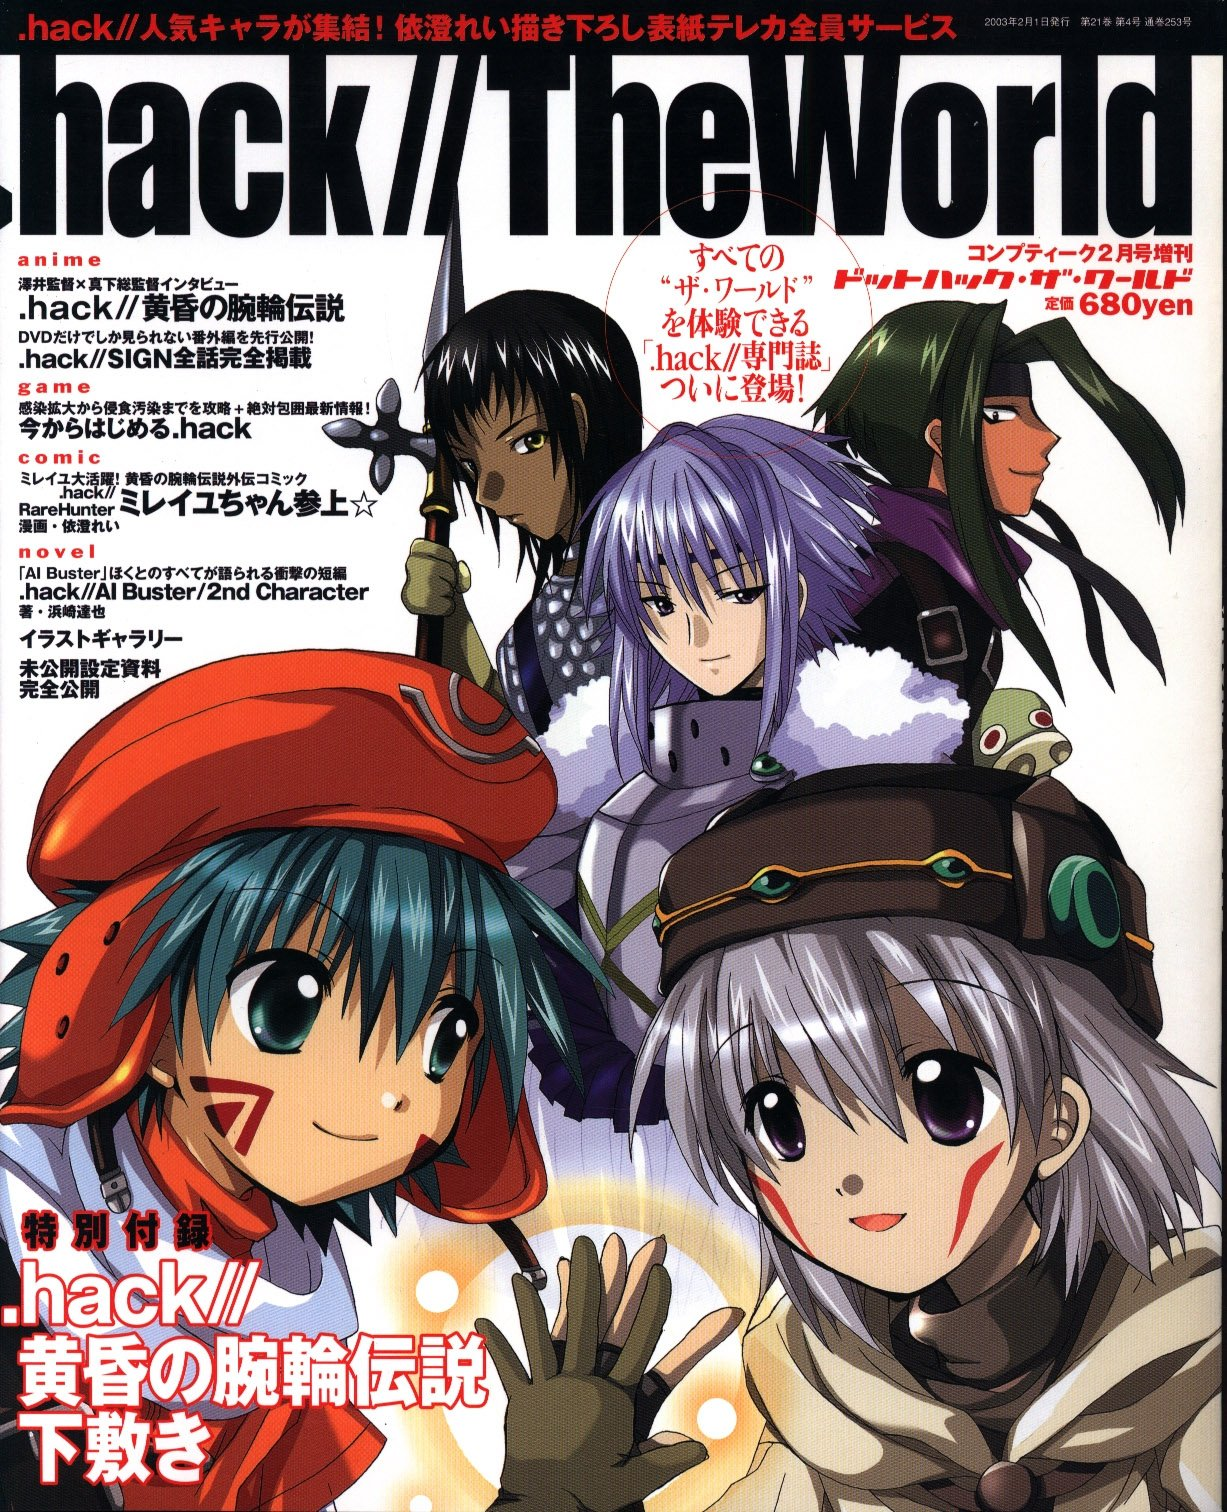 Comptiq Issue 253 (.hack\\TheWorld Vol.1) (February 2003)